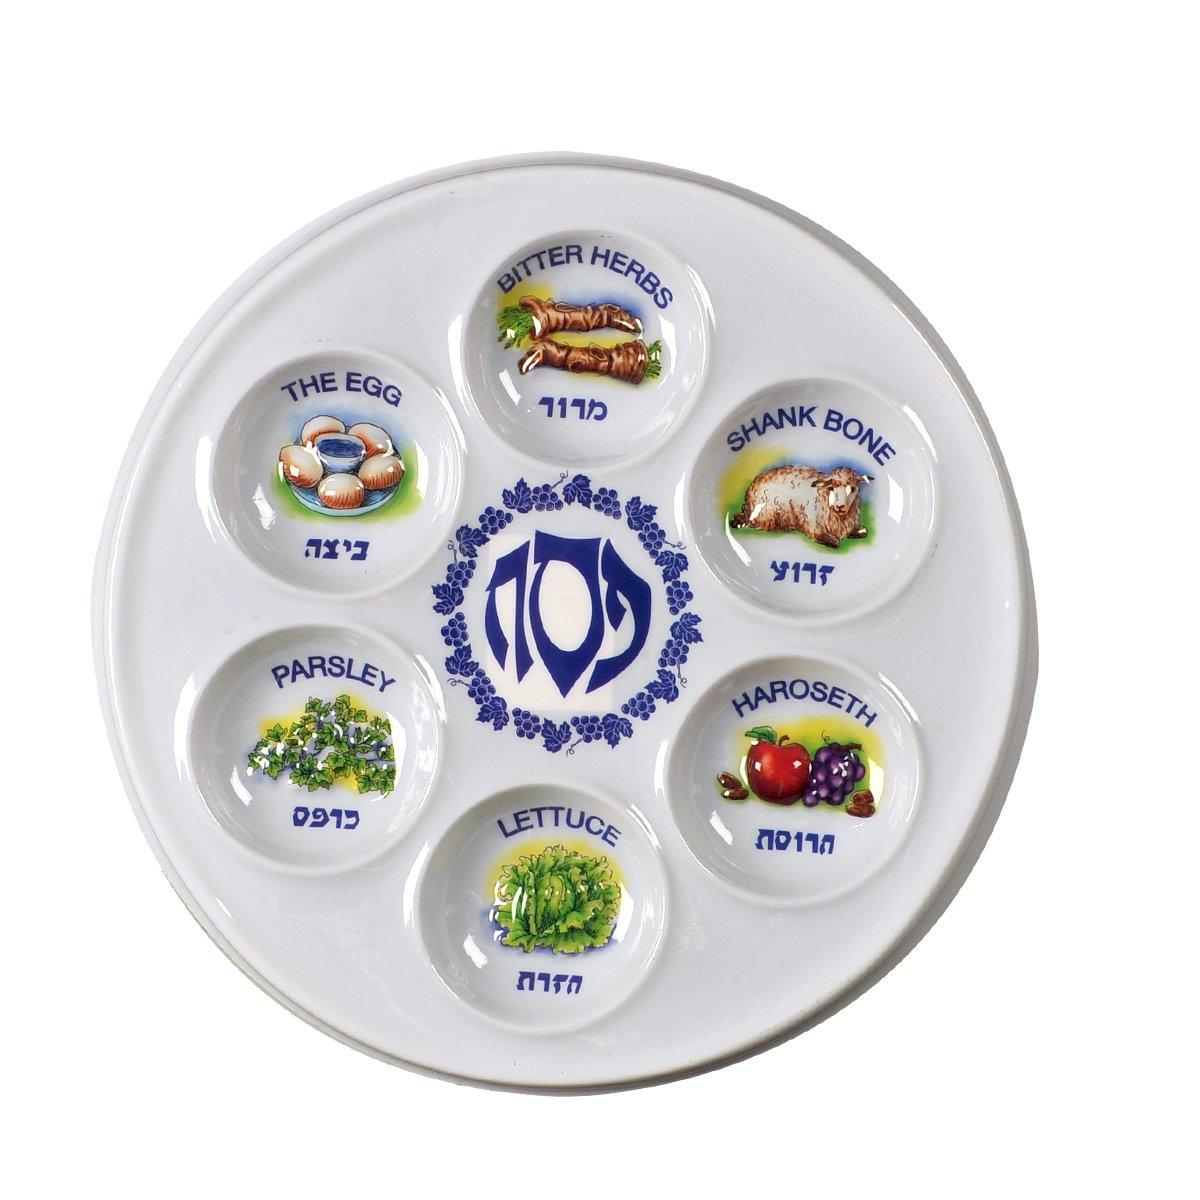 Amazon.com Plastic Disposable Passover Seder Plates - Set of 6 - Colorful Vintage Look Kitchen u0026 Dining  sc 1 st  Amazon.com & Amazon.com: Plastic Disposable Passover Seder Plates - Set of 6 ...